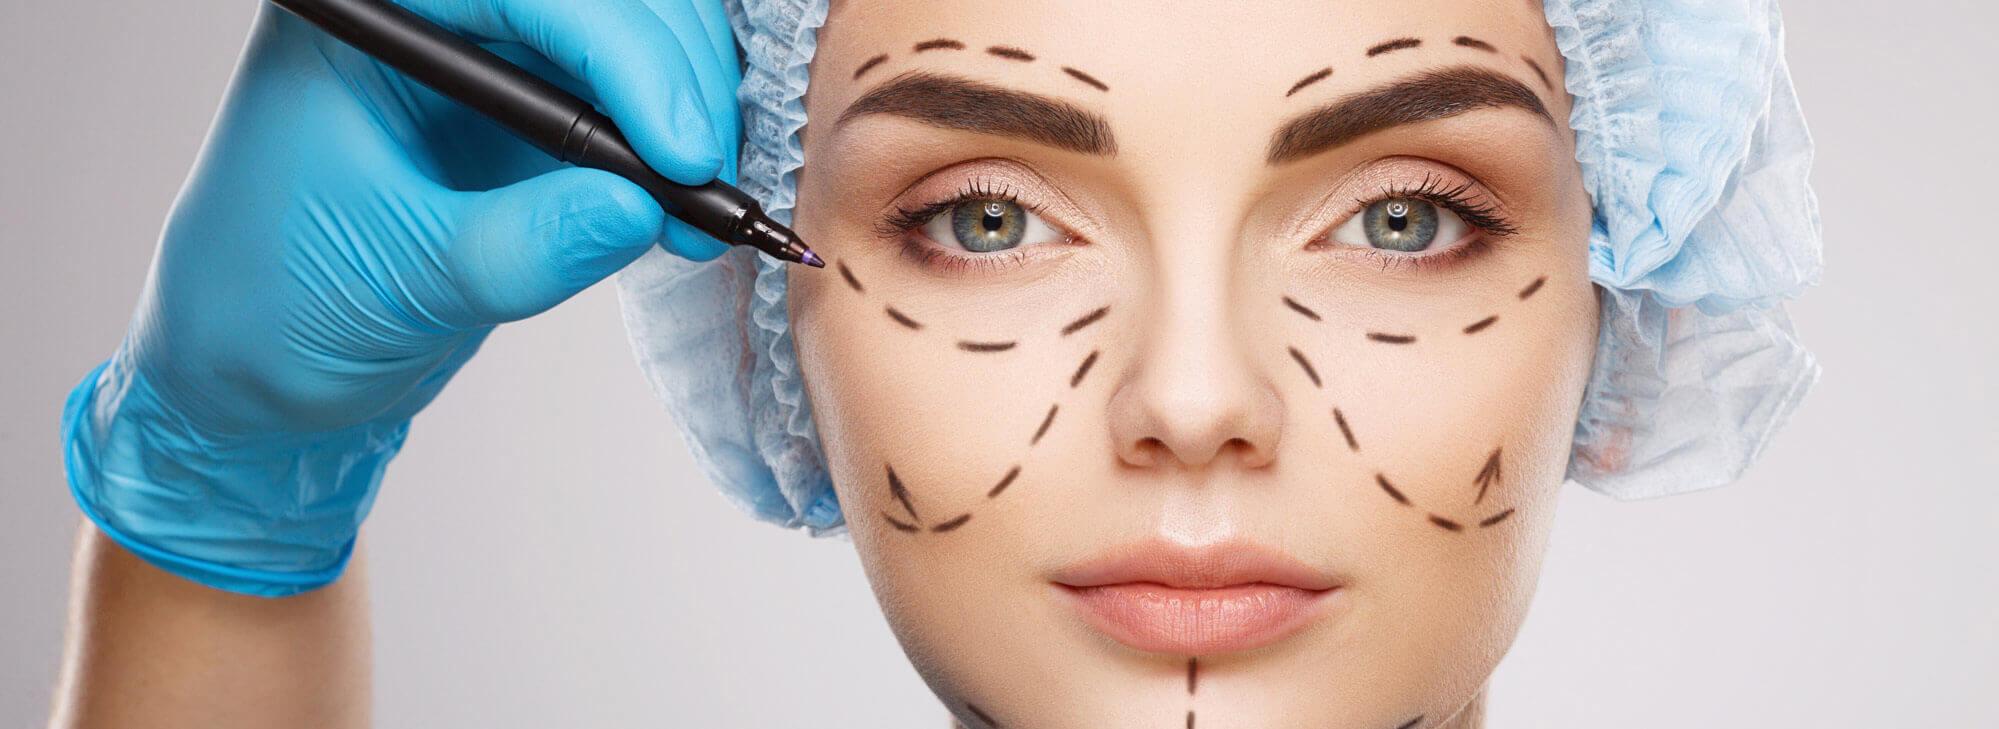 odstranění vrasek cbp klinika esteticko plasticke chirurgie